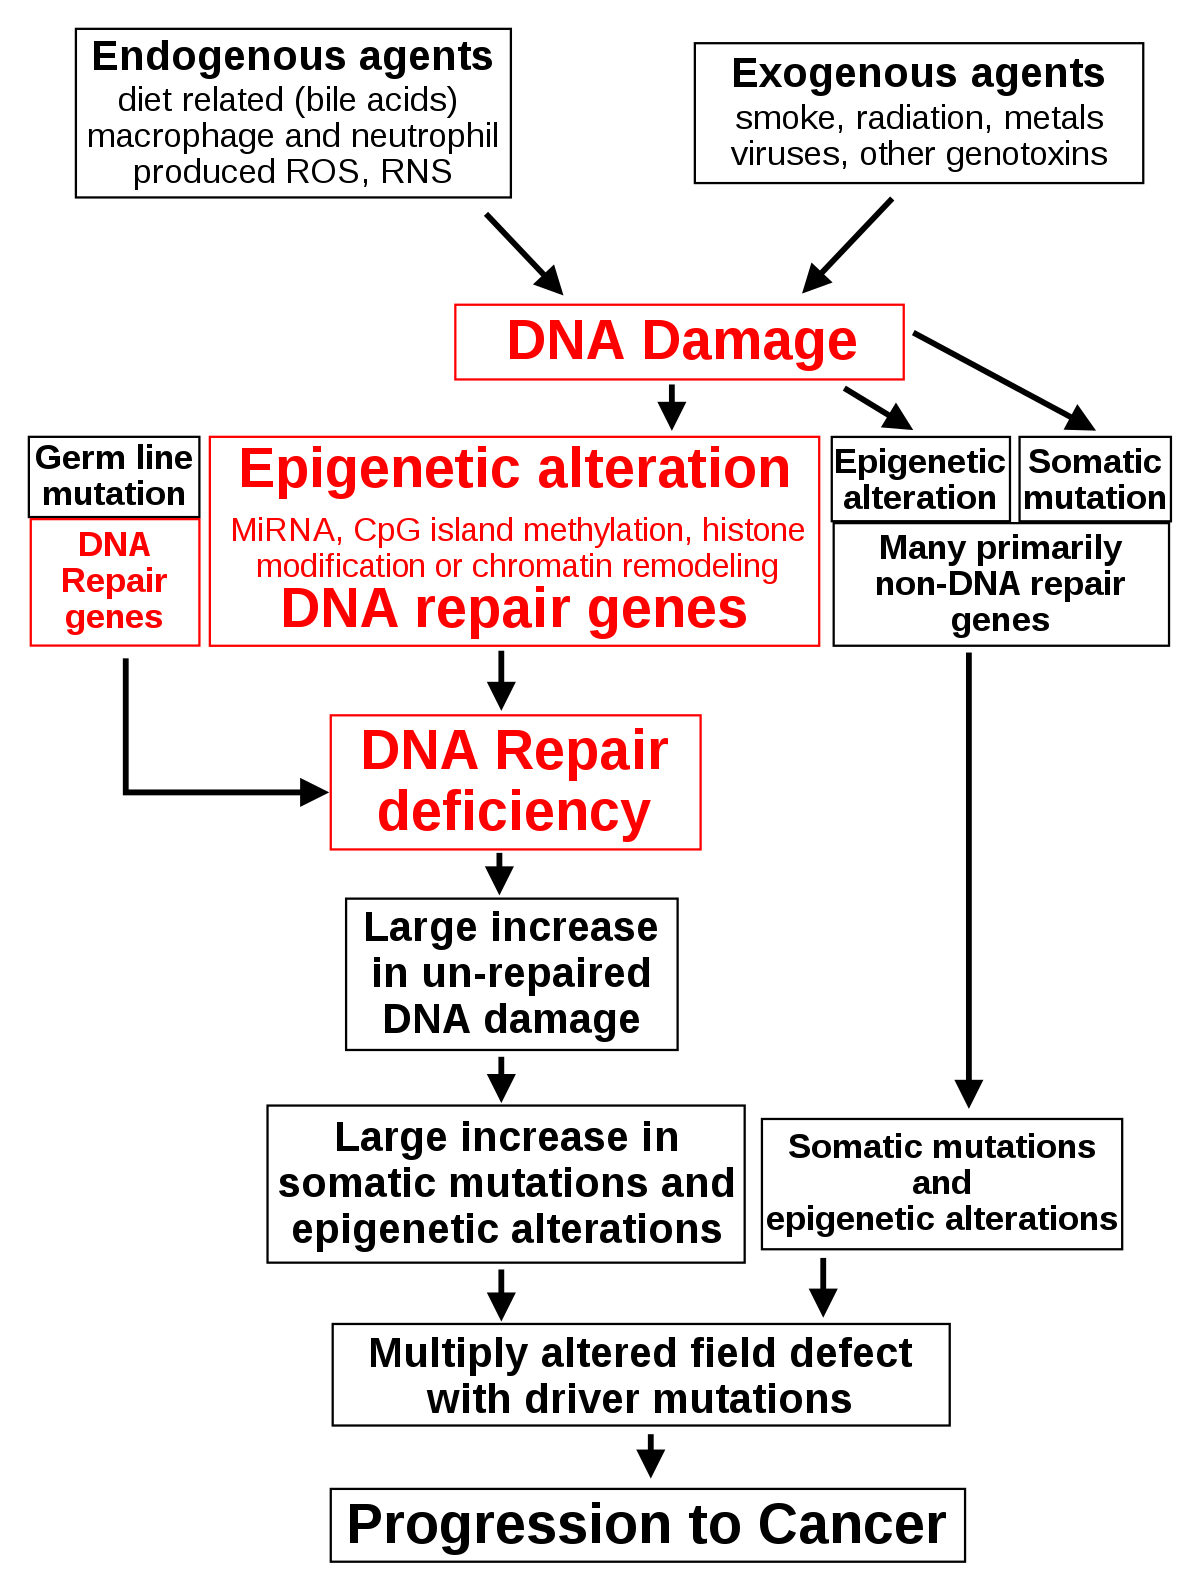 endometrium rákos kor